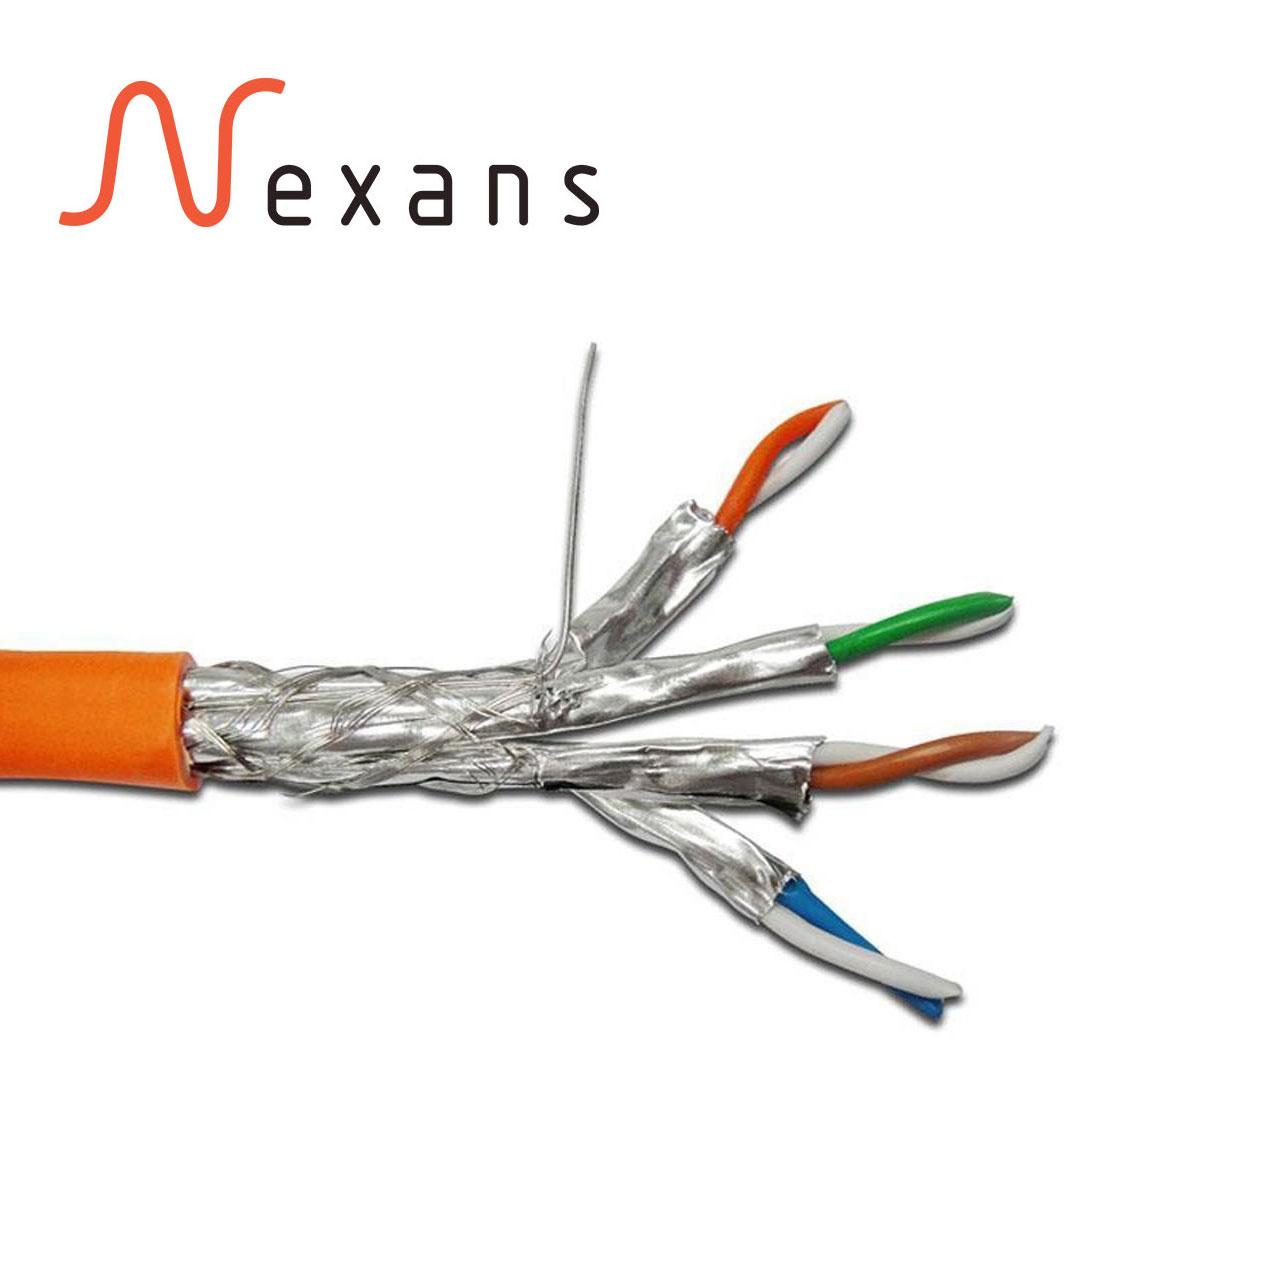 کابل شبکه CAT7 نگزنس Nexans